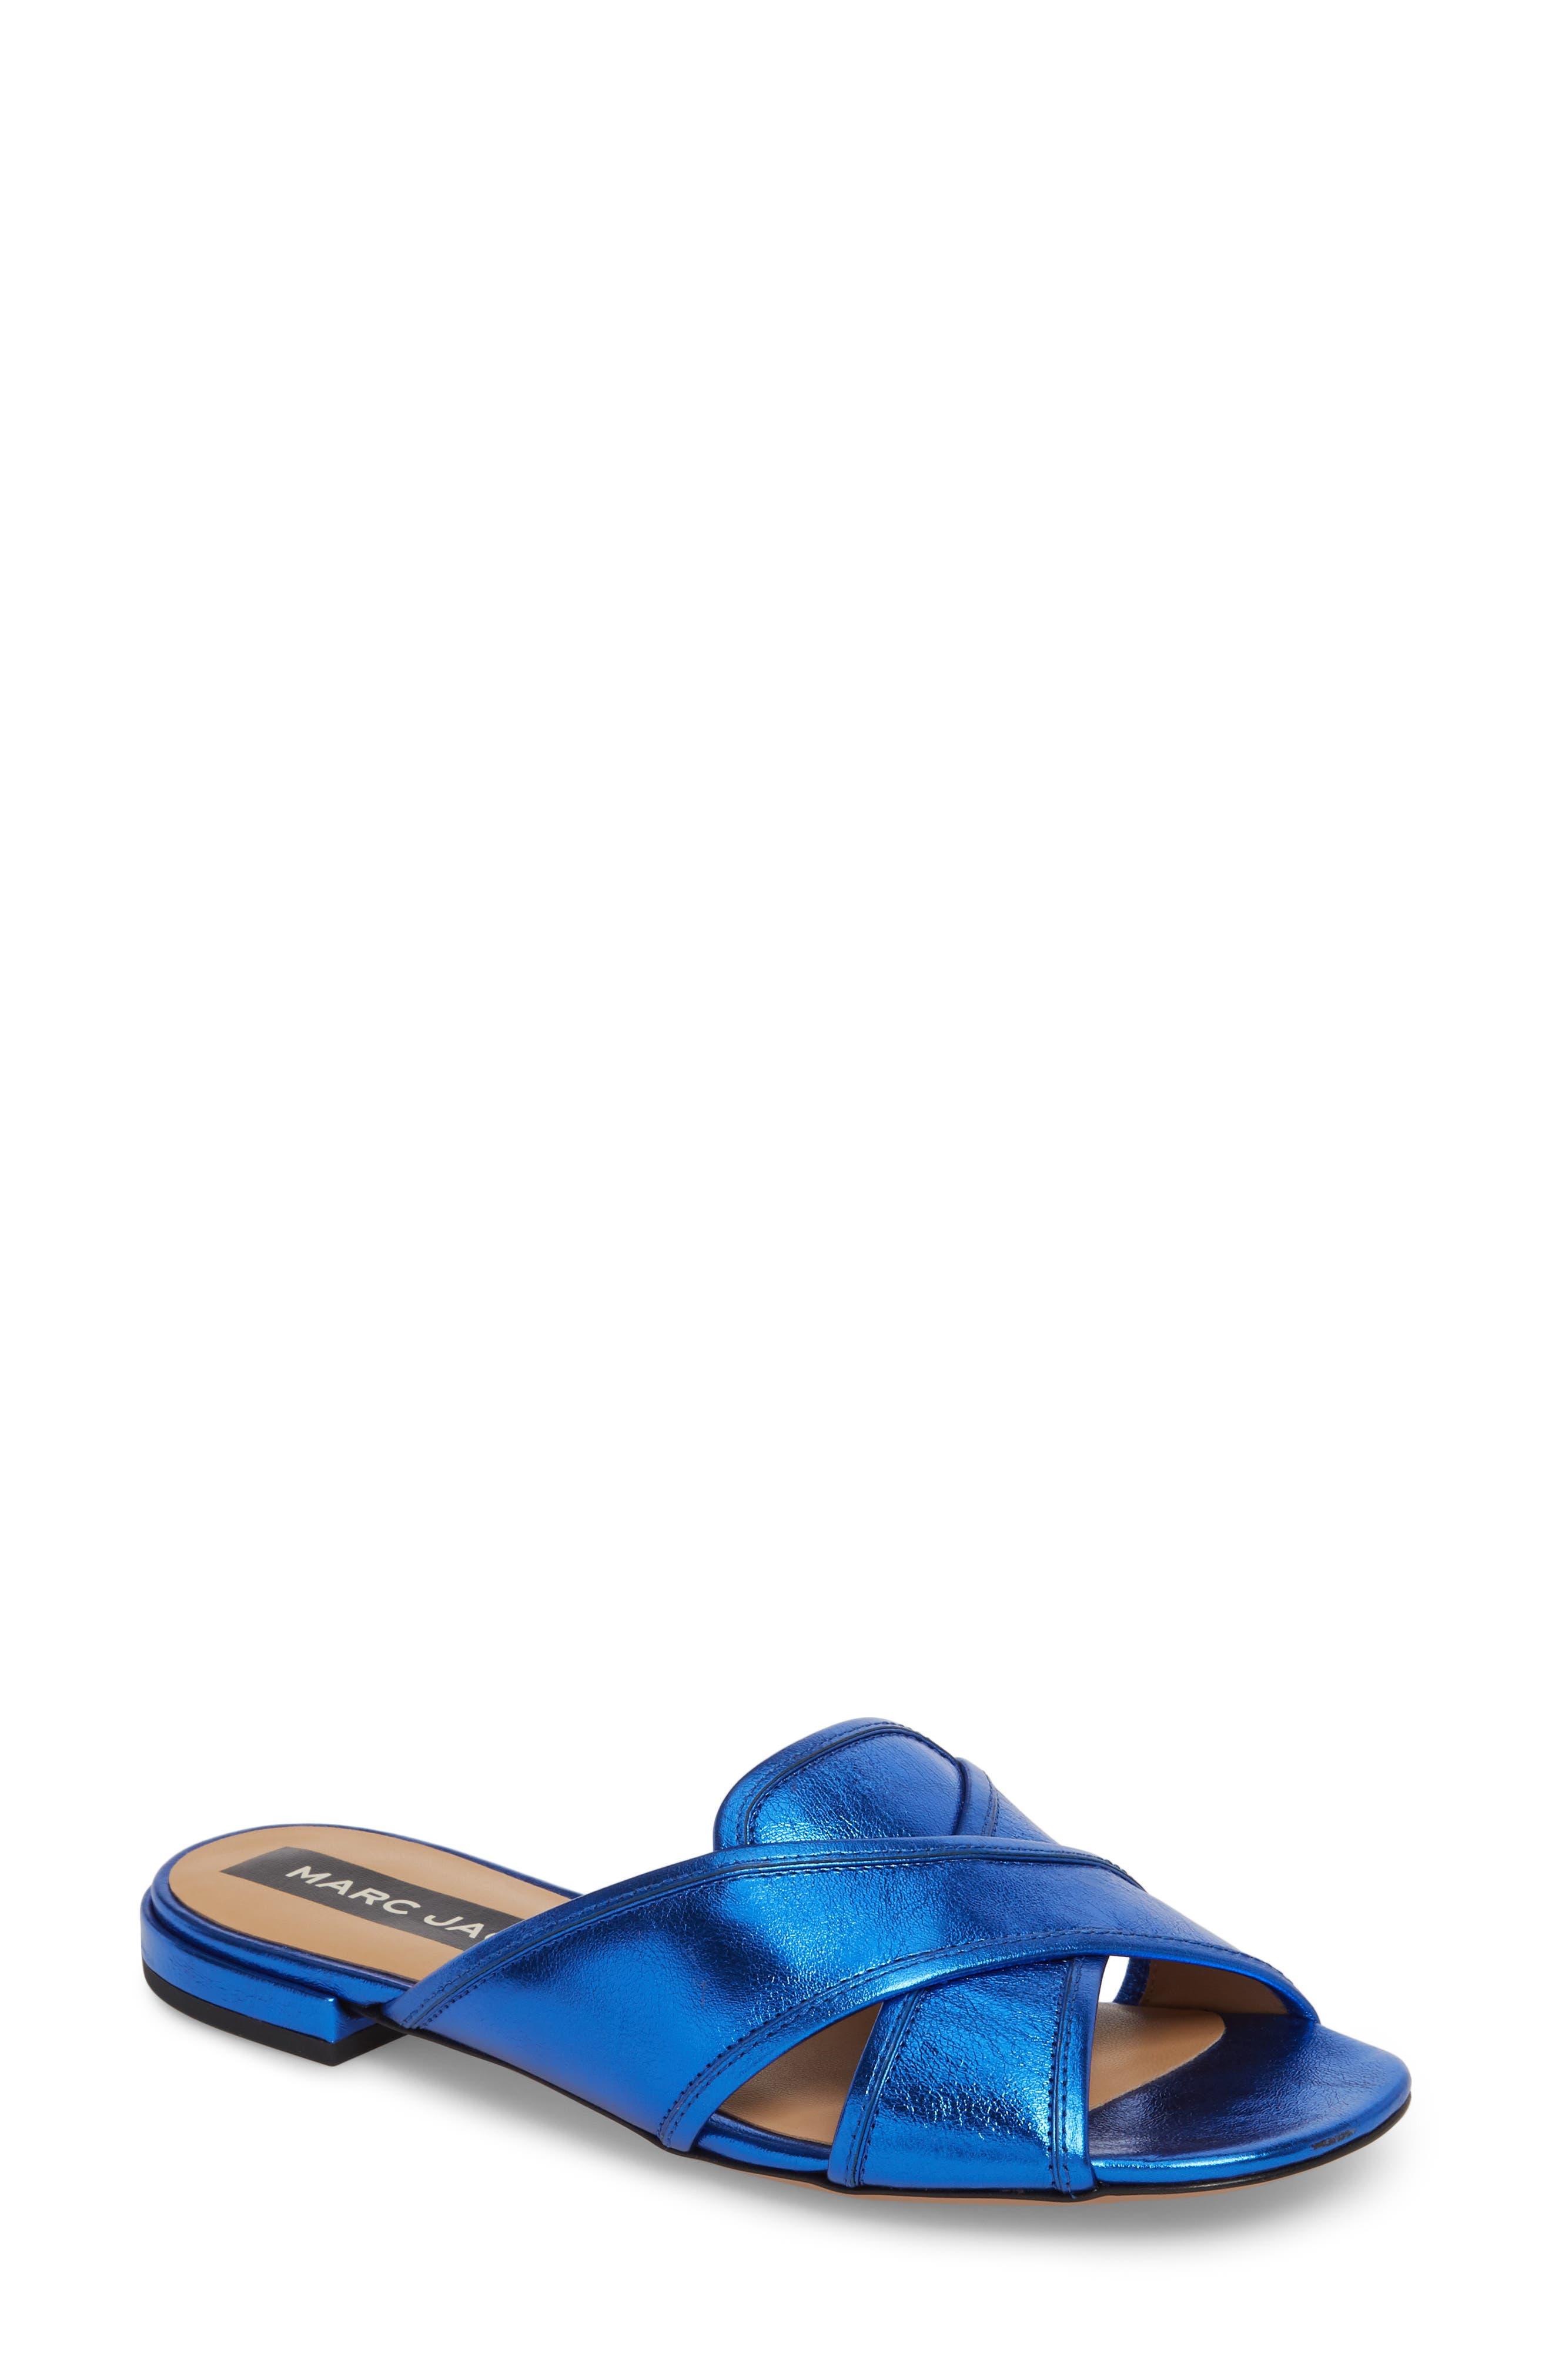 Aurora Metallic Slide Sandal,                             Main thumbnail 1, color,                             BLUE